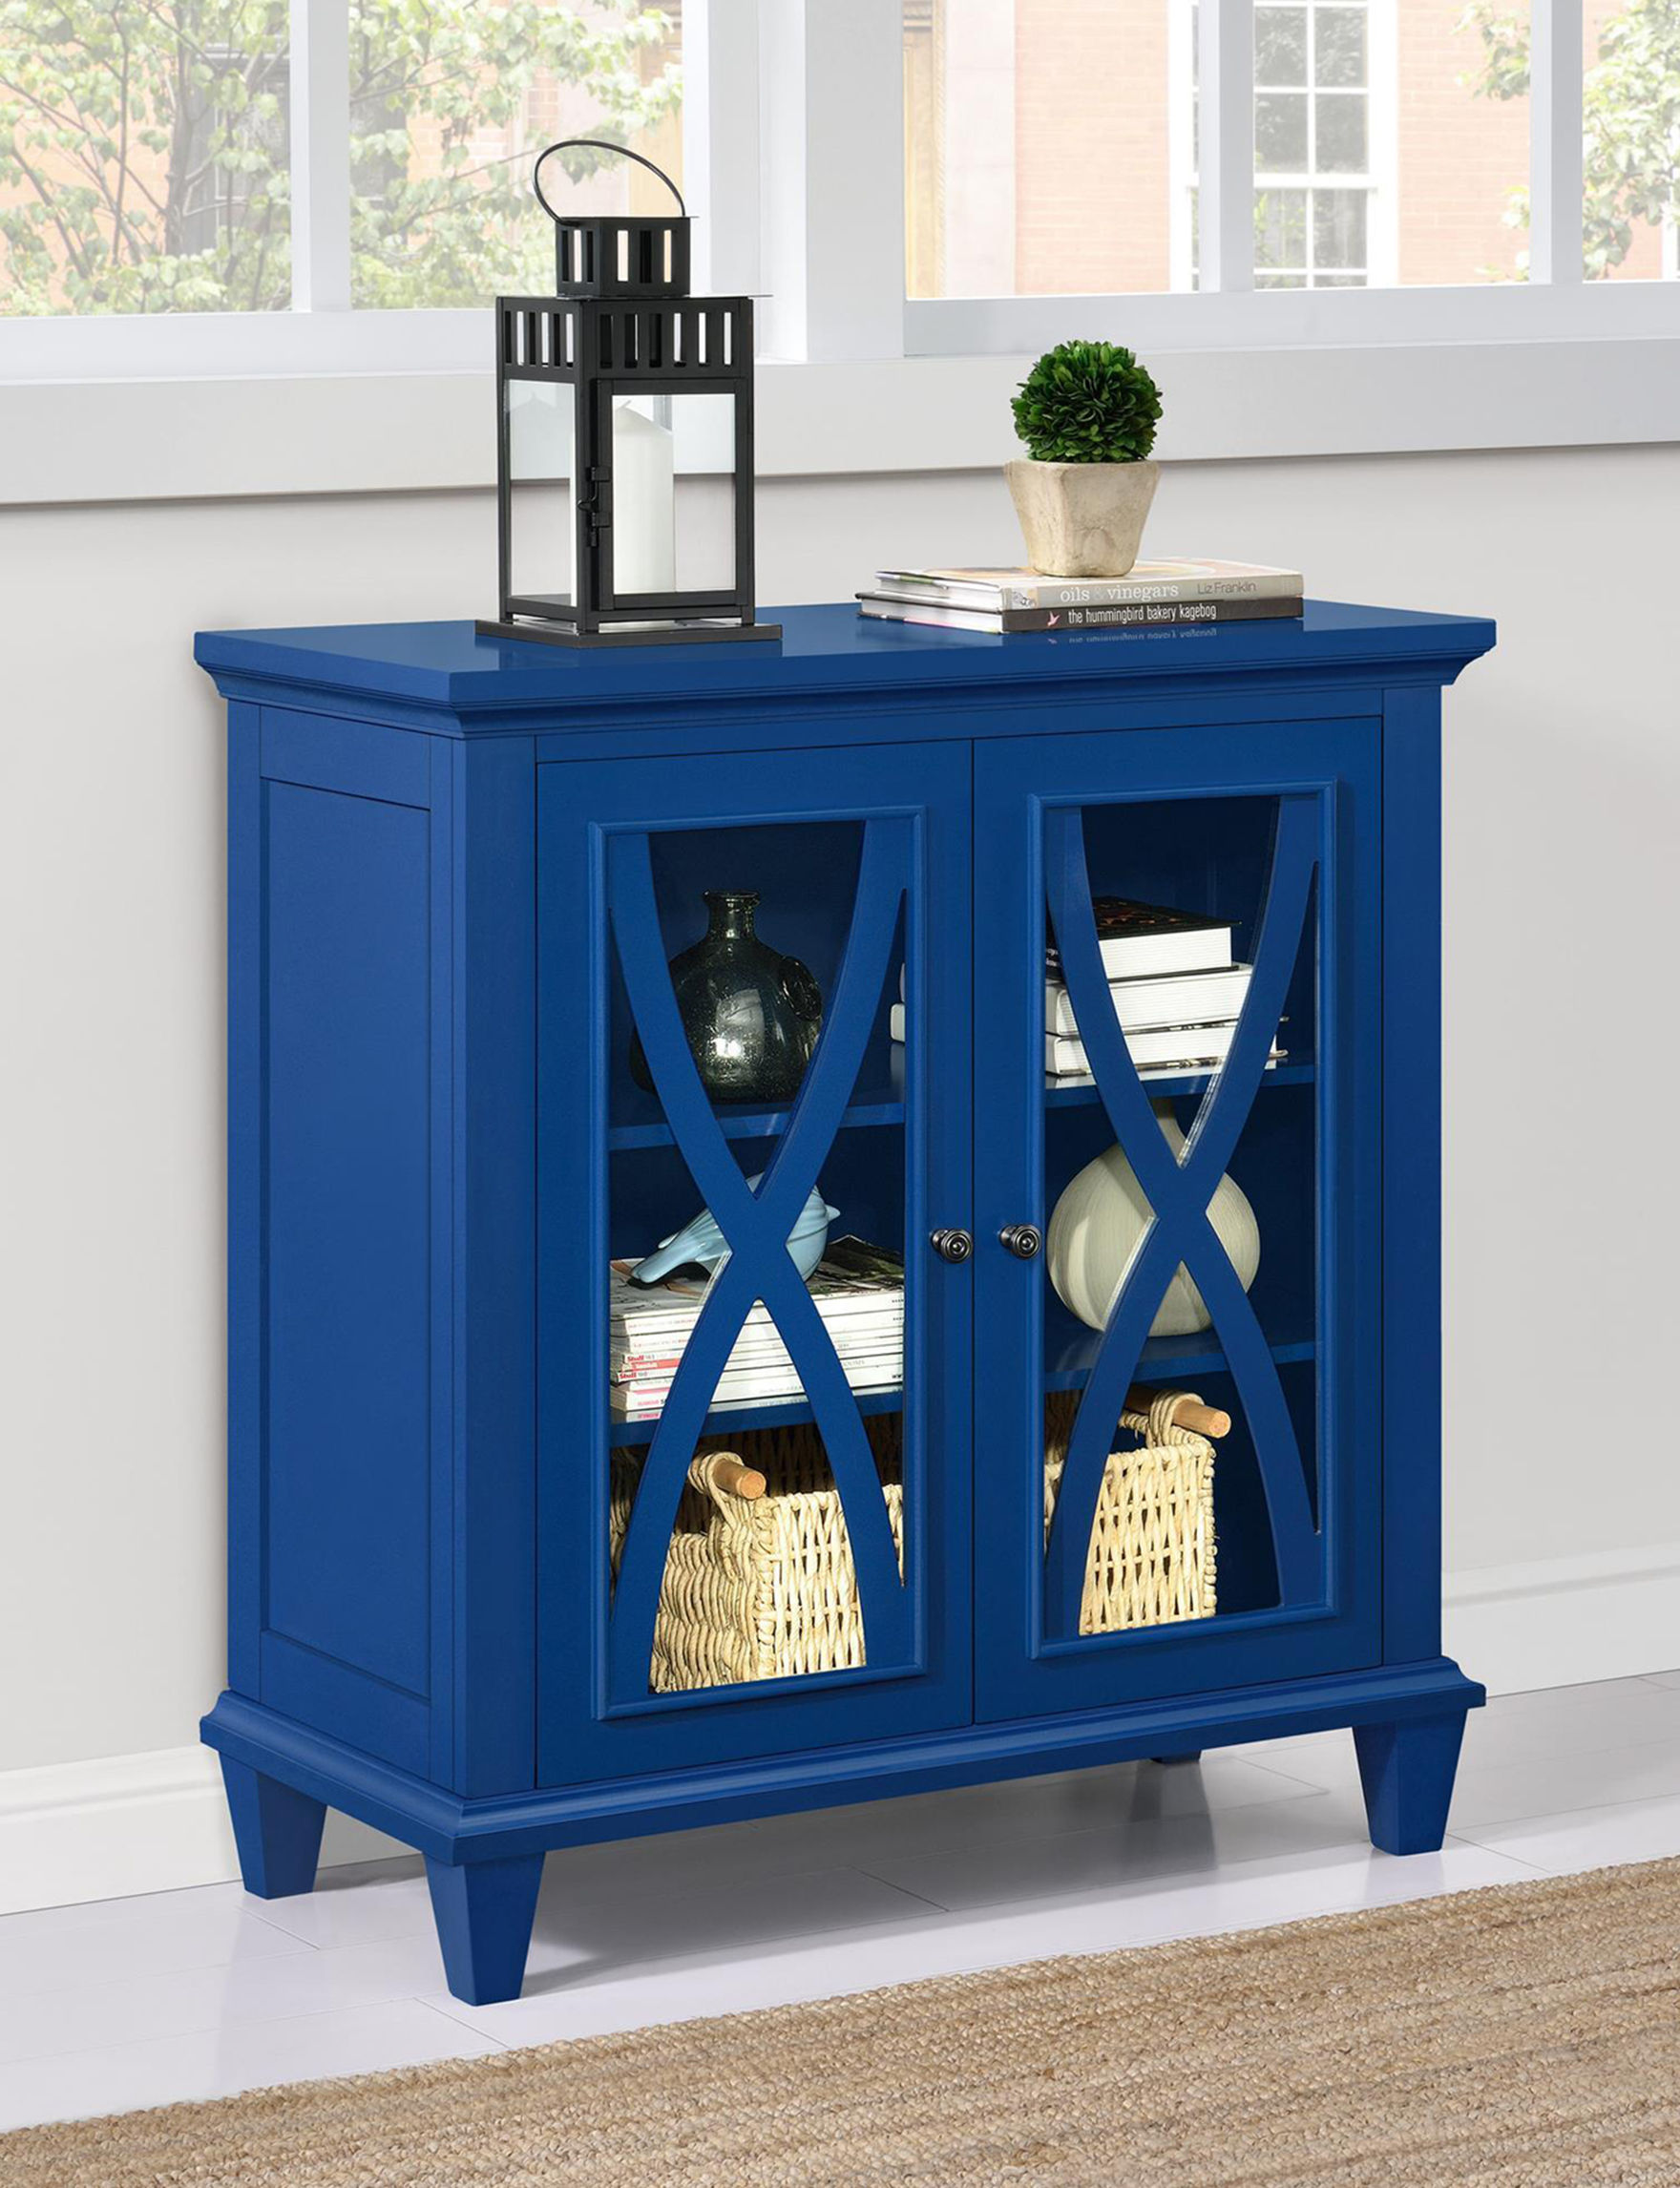 Ameriwood Blue Cabinets & Cupboards Living Room Furniture